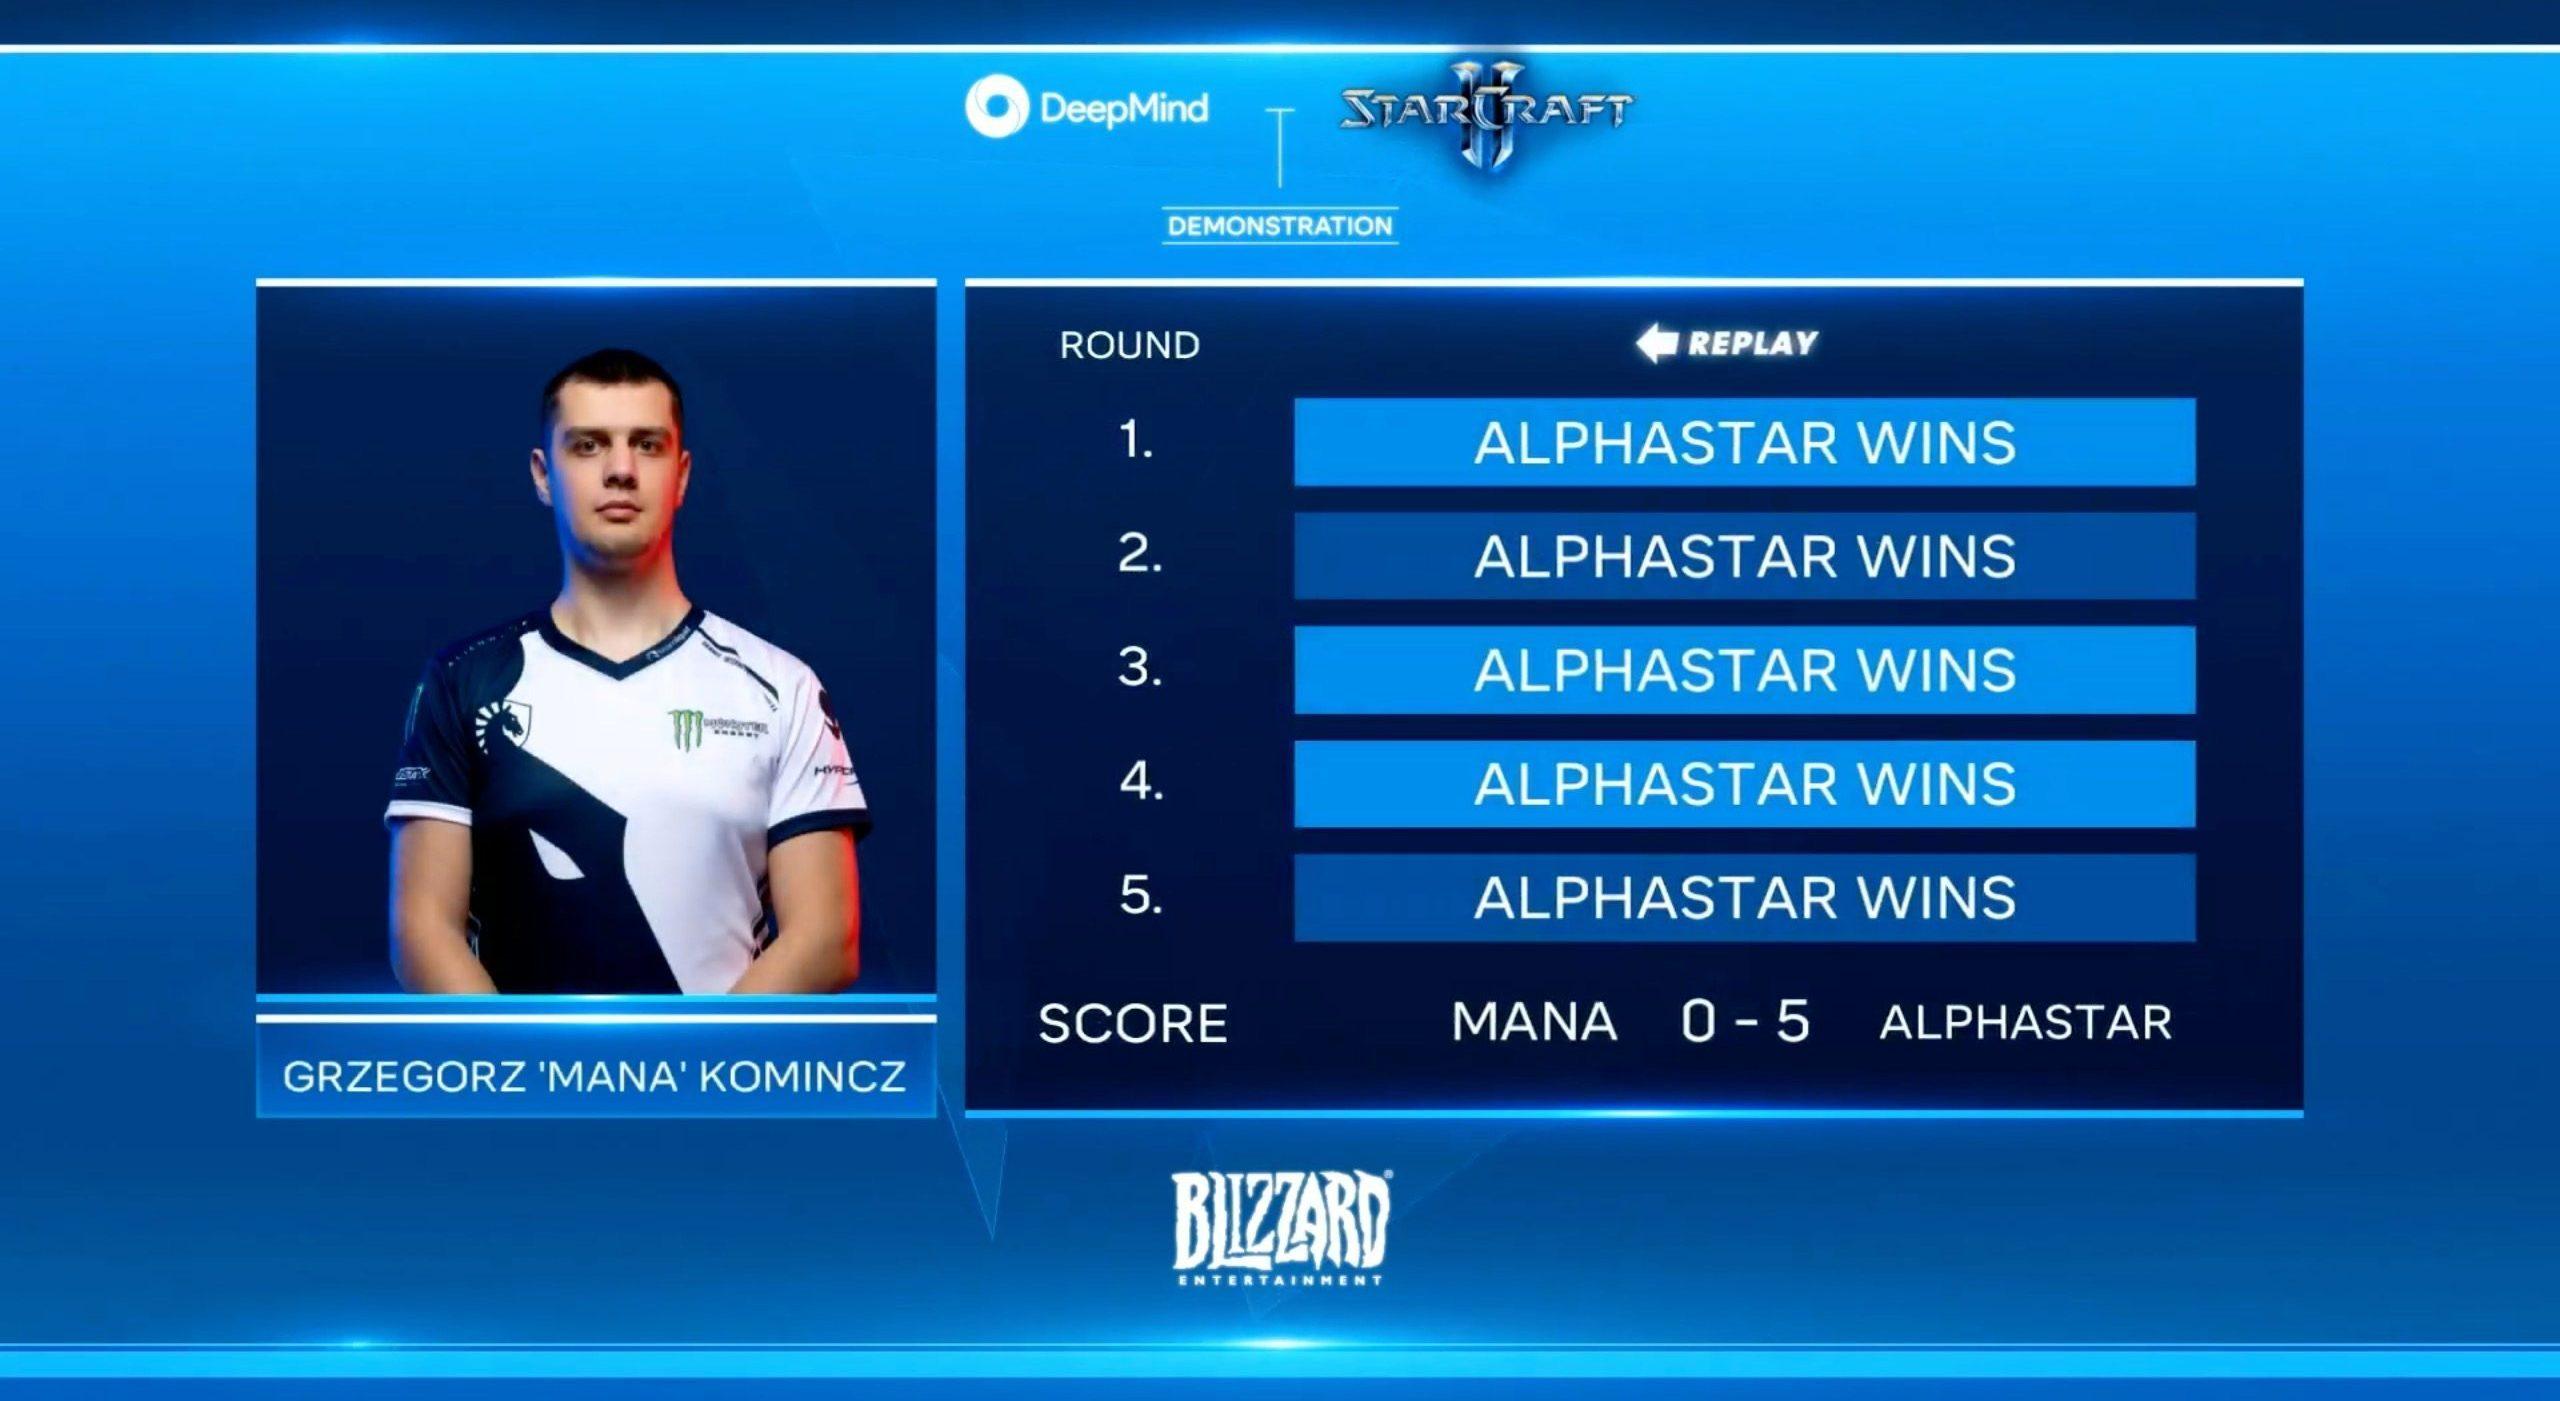 DeepMind AlphaStar AI wins 10-1 against StarCraft II gamers - 9to5Google